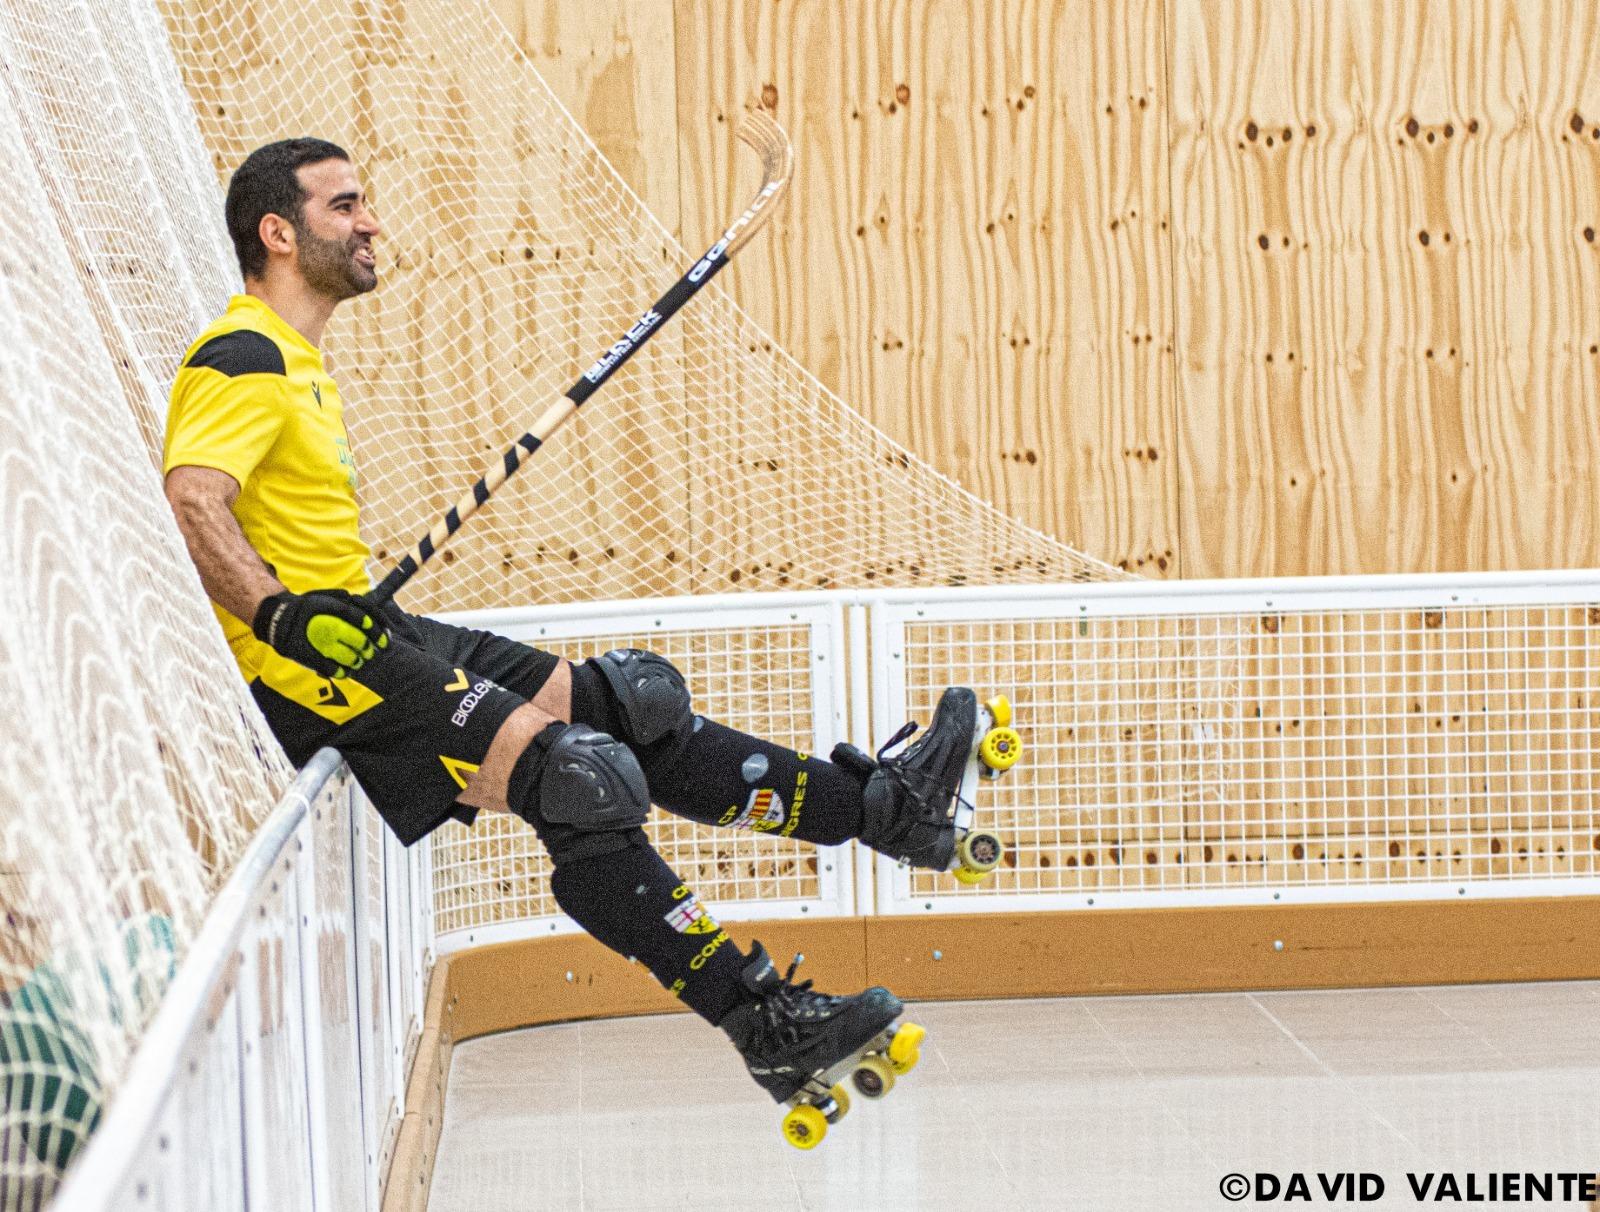 Celebració d'un gol | David Valiente